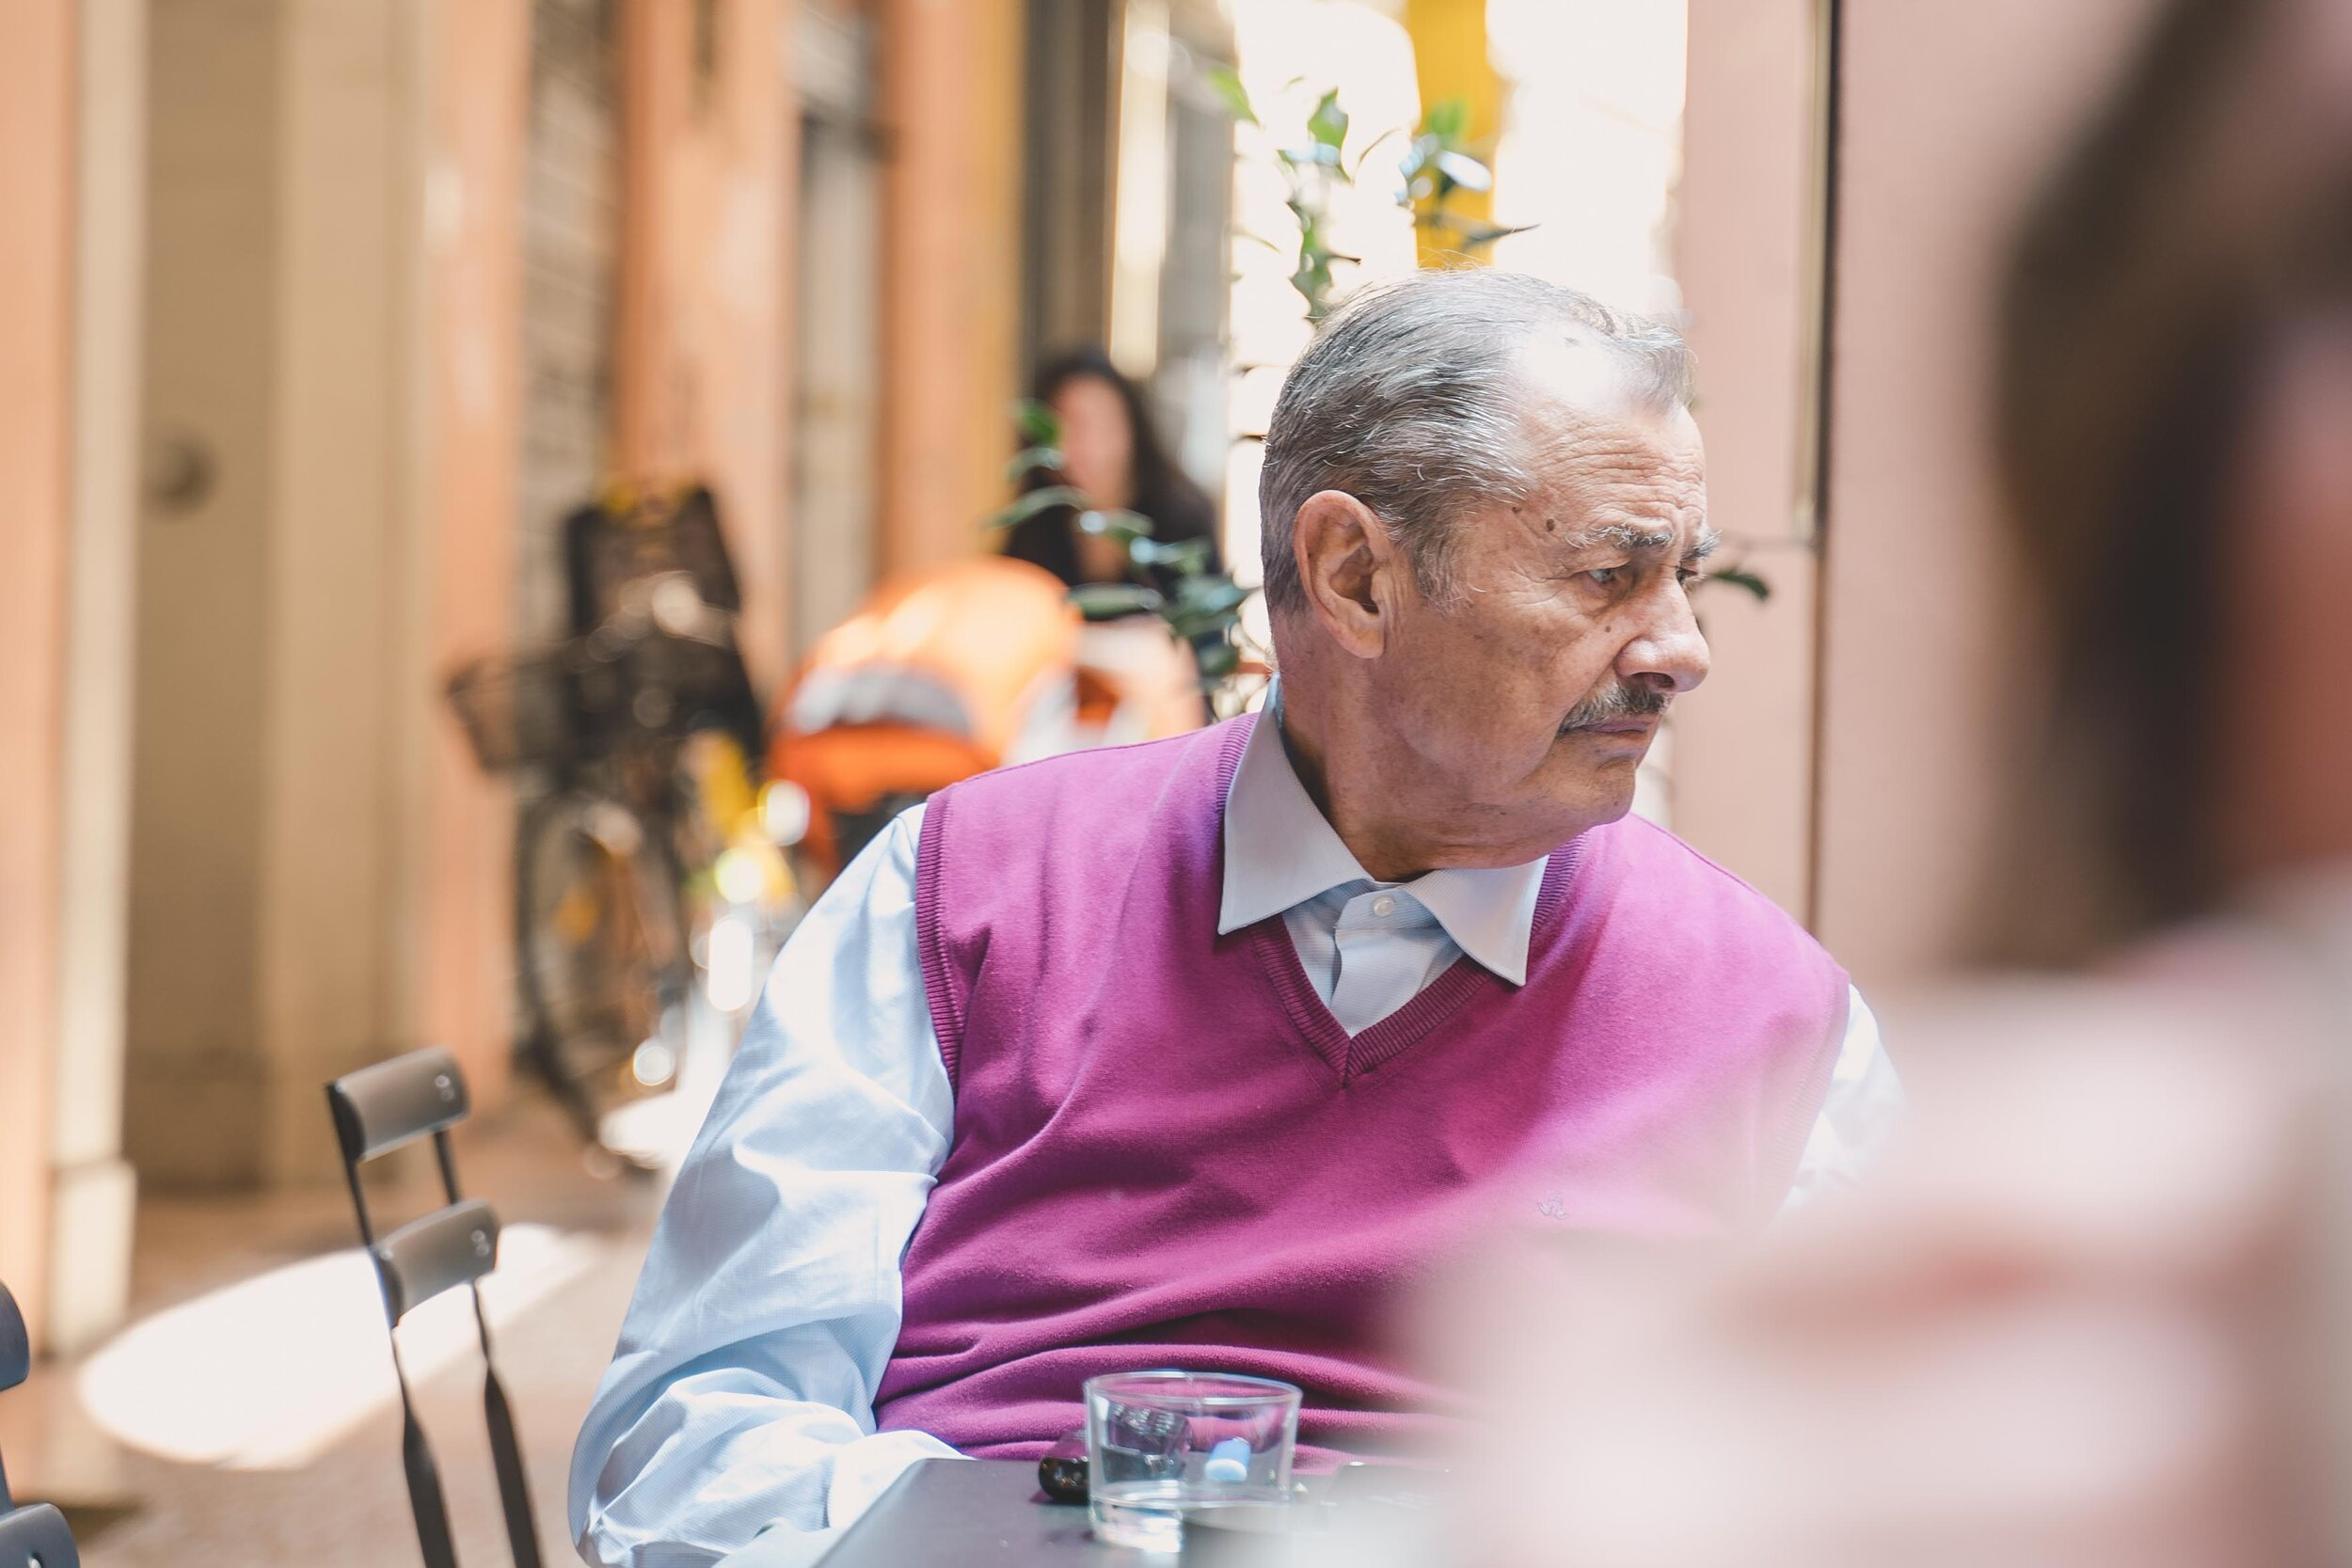 man chatting while drinking coffee.jpg